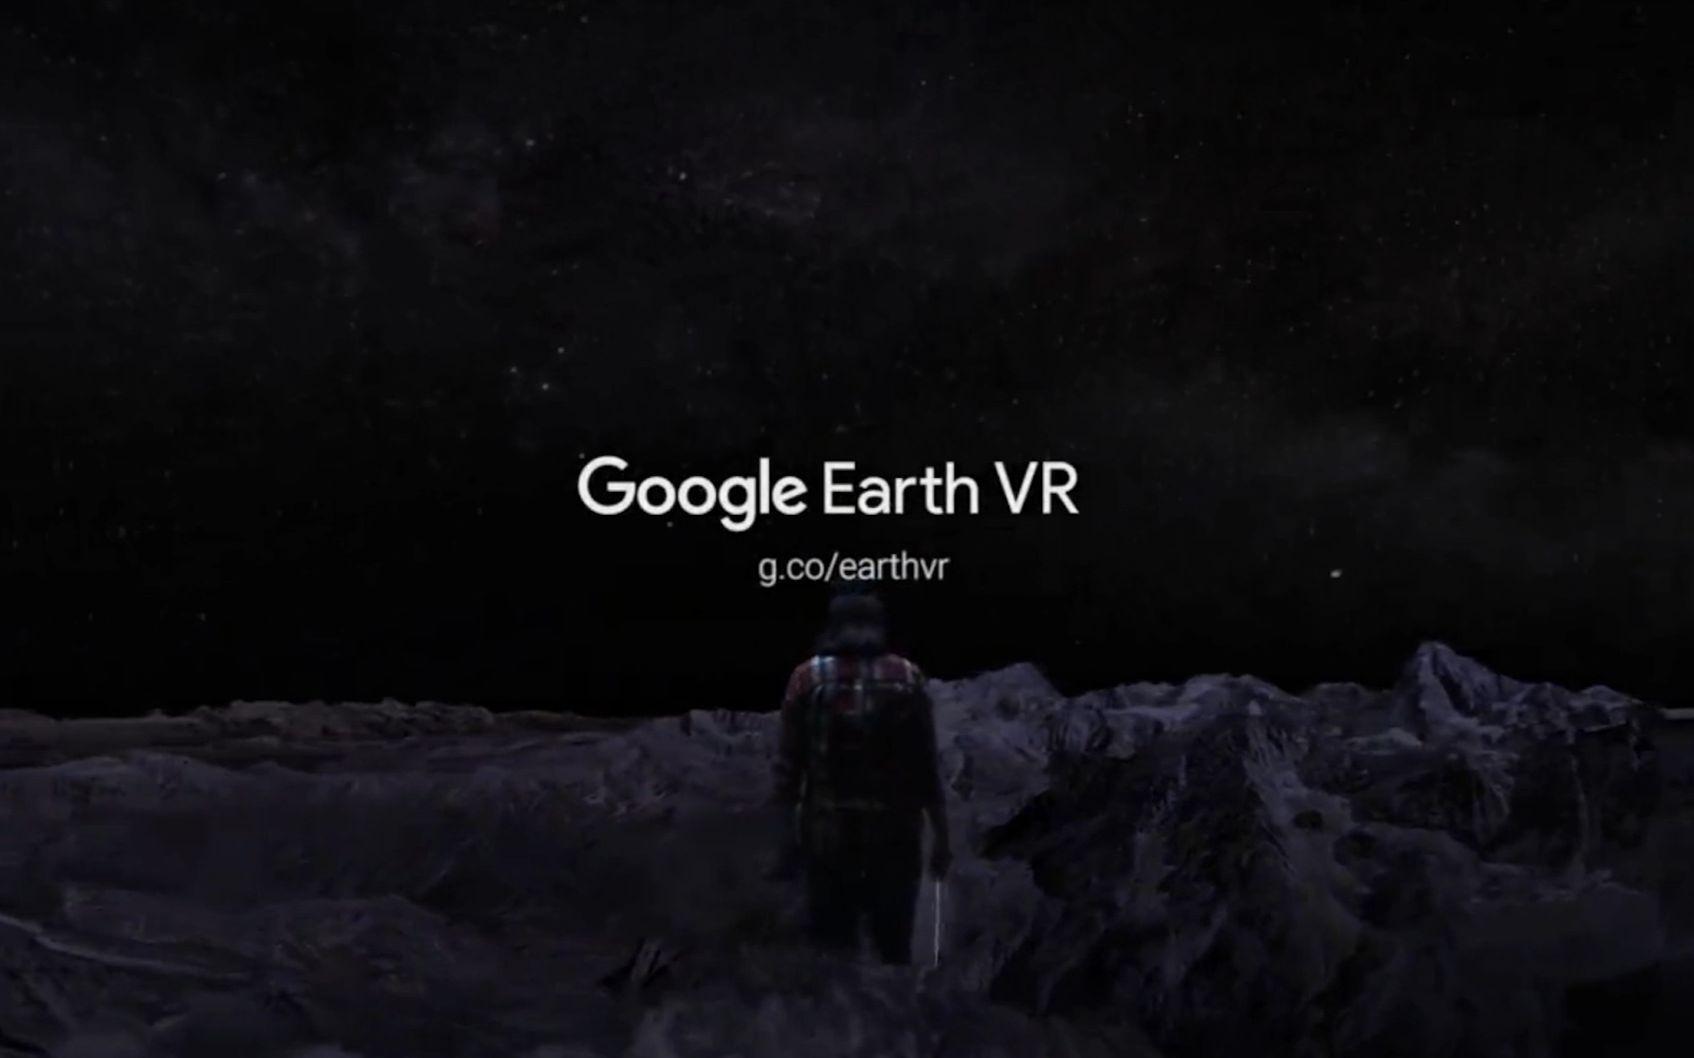 VR史上最牛逼的视频GoogleEarthVR-爱哔哩软件互动vr图片